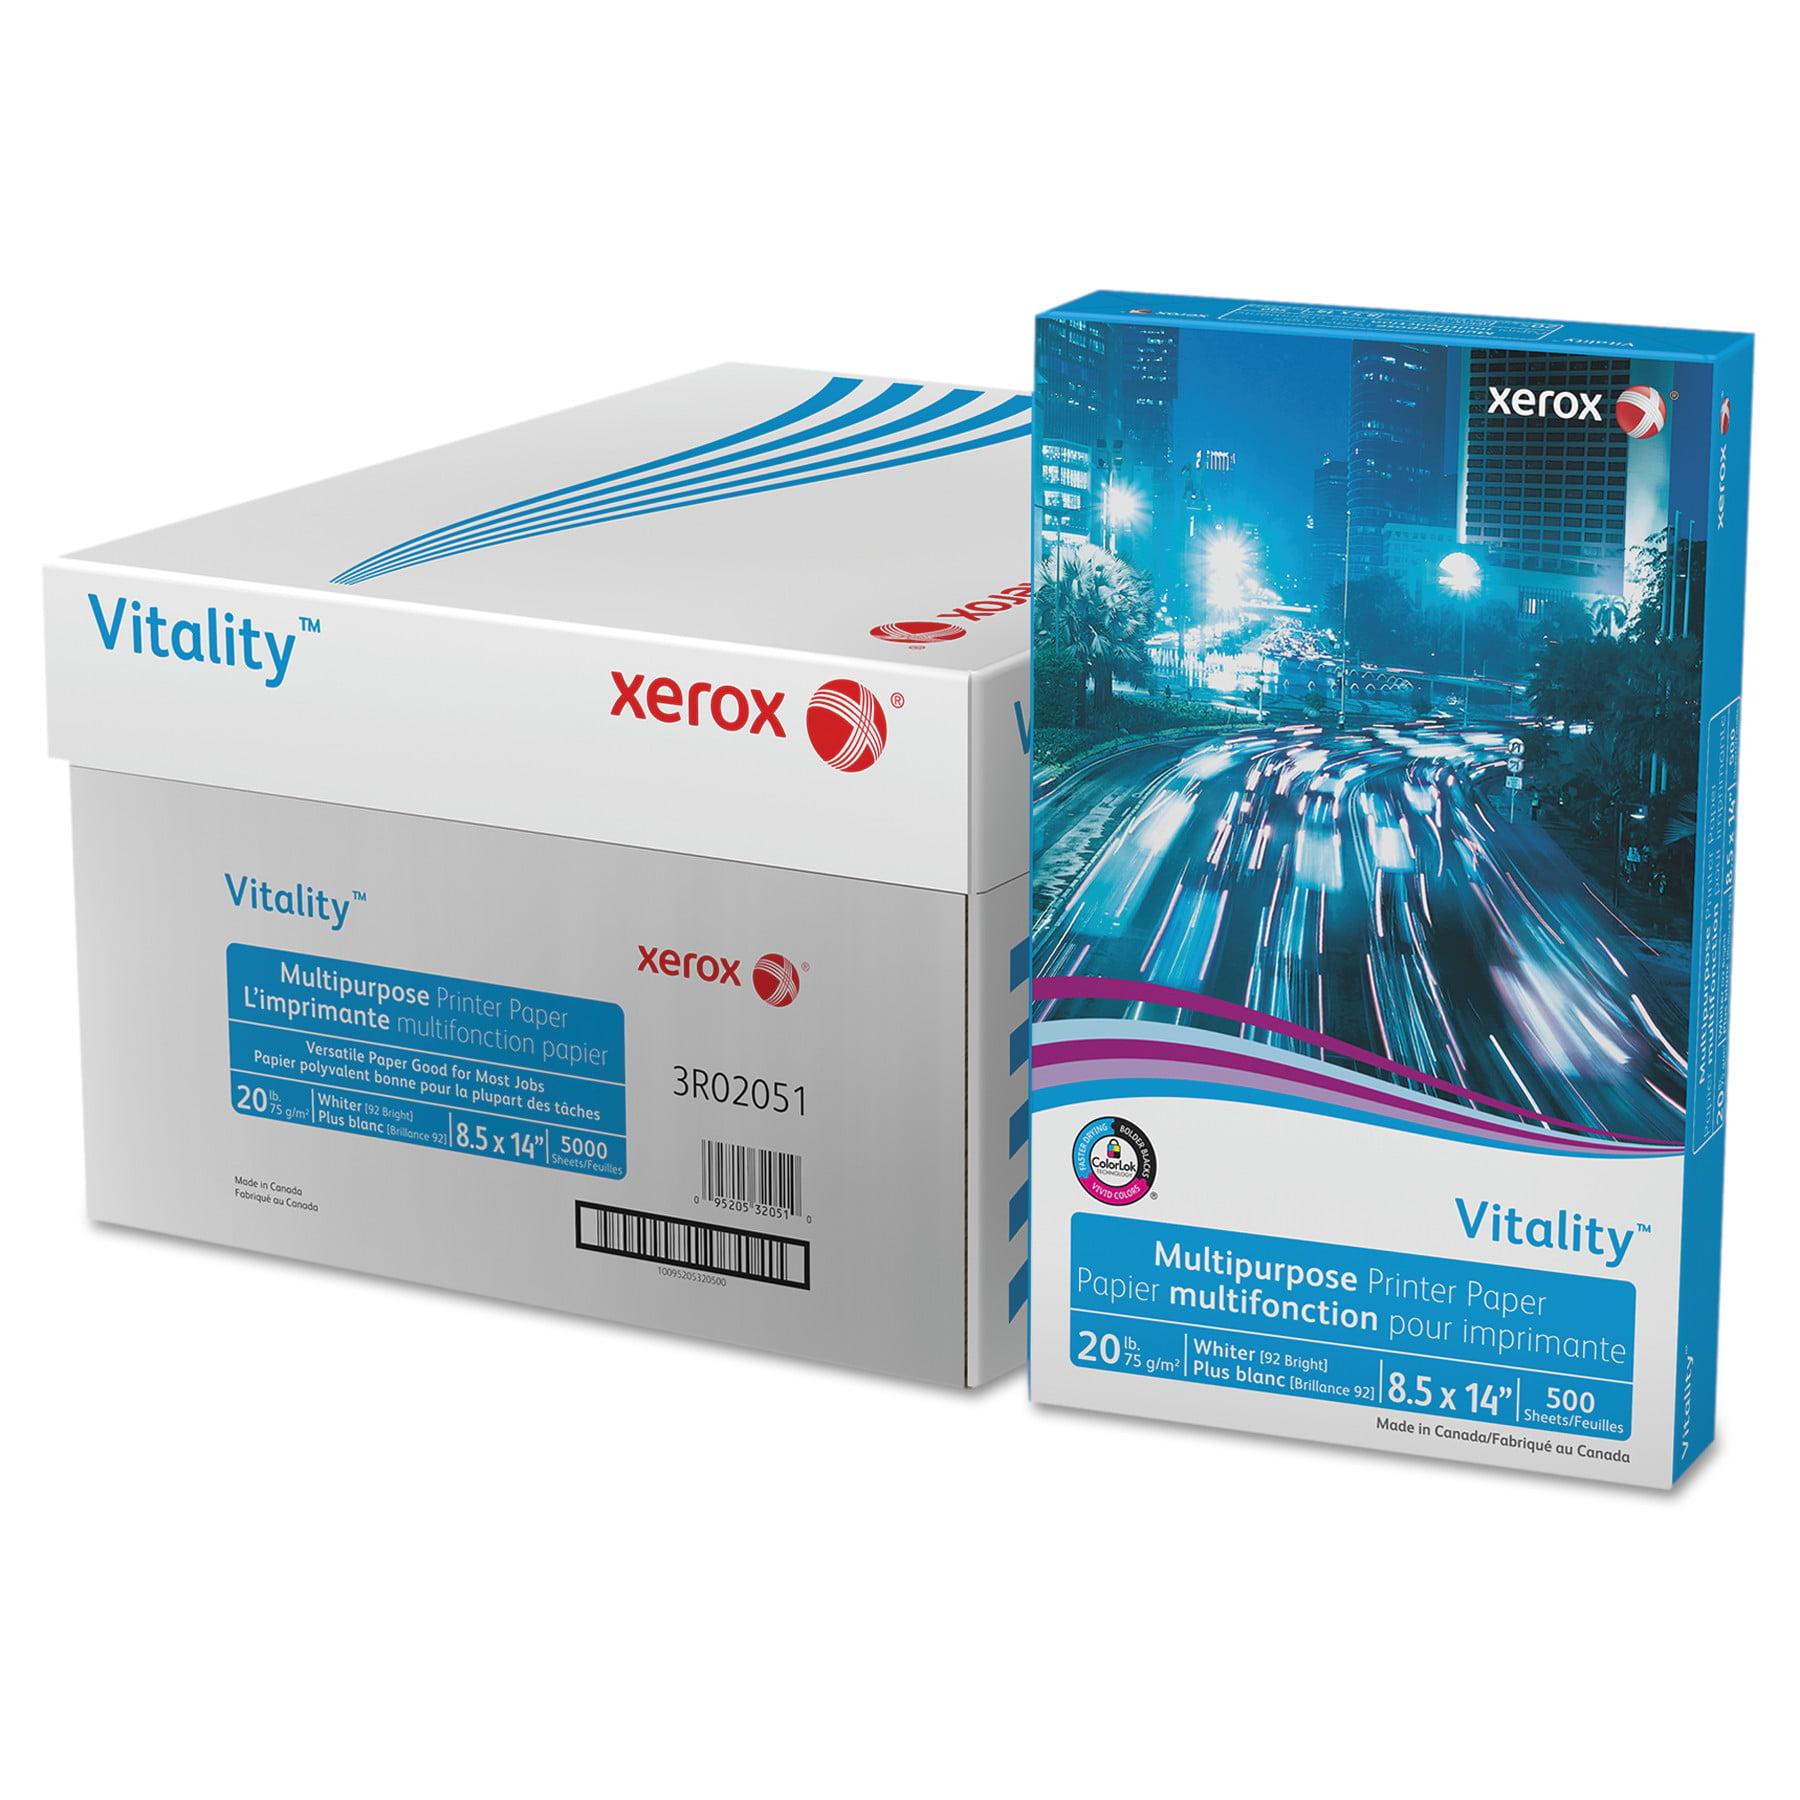 Xerox Vitality Multipurpose Printer Paper, 8 1/2 x 14, White, 5,000 Sheets/CT